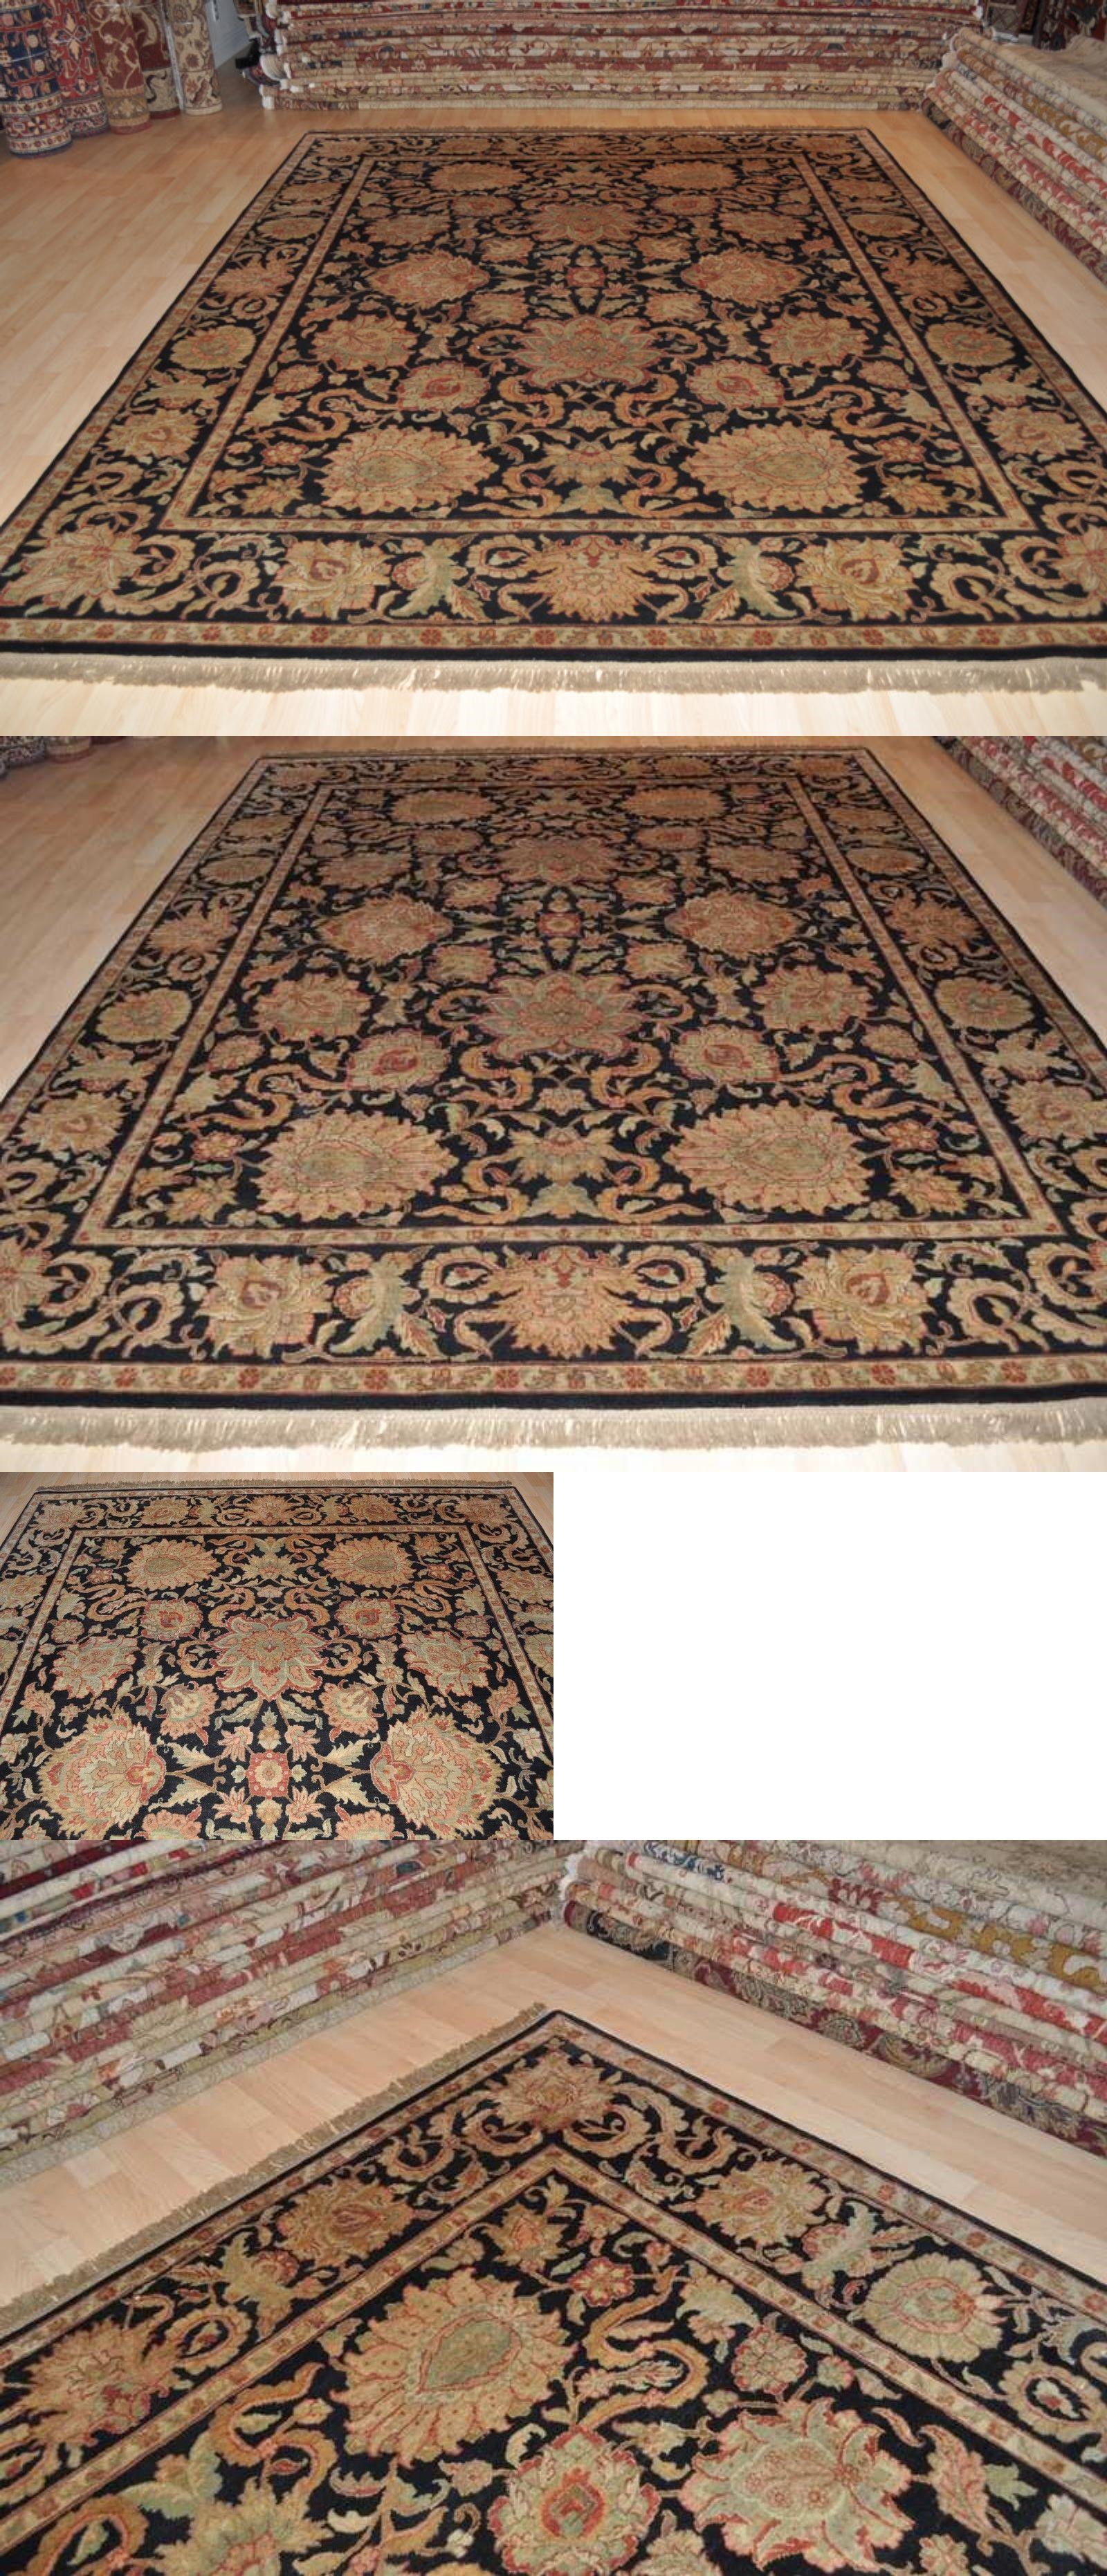 Rugs And Carpets 37978 8 X 10 Handmade Oriental Rug Persian Design Wool Fine Quality Wool Carpet Rug Bu Handmade Oriental Rugs Buying Carpet Rugs On Carpet